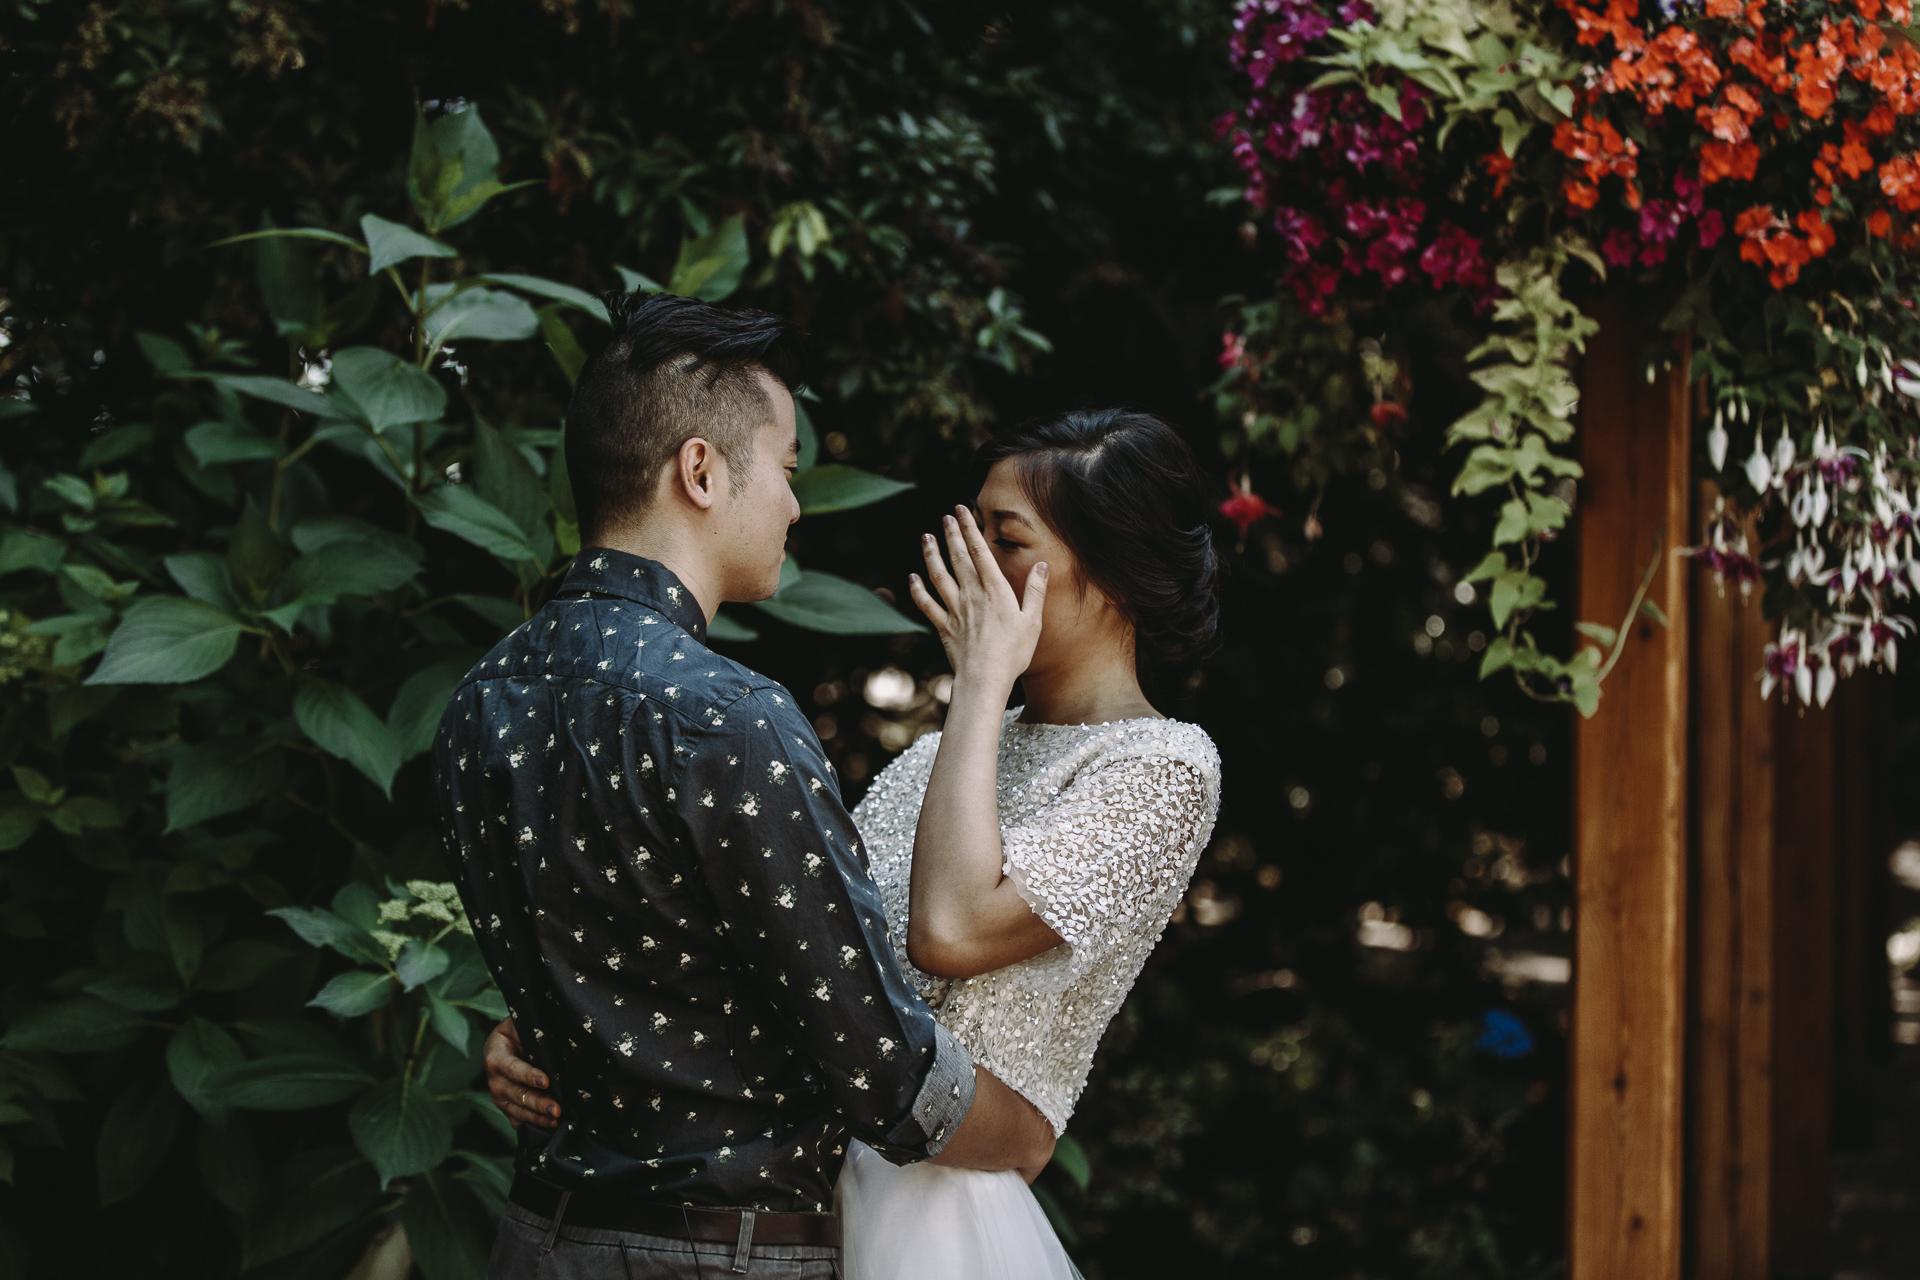 jess-hunter-seattle-artistic-wedding-photographer-4059.jpg